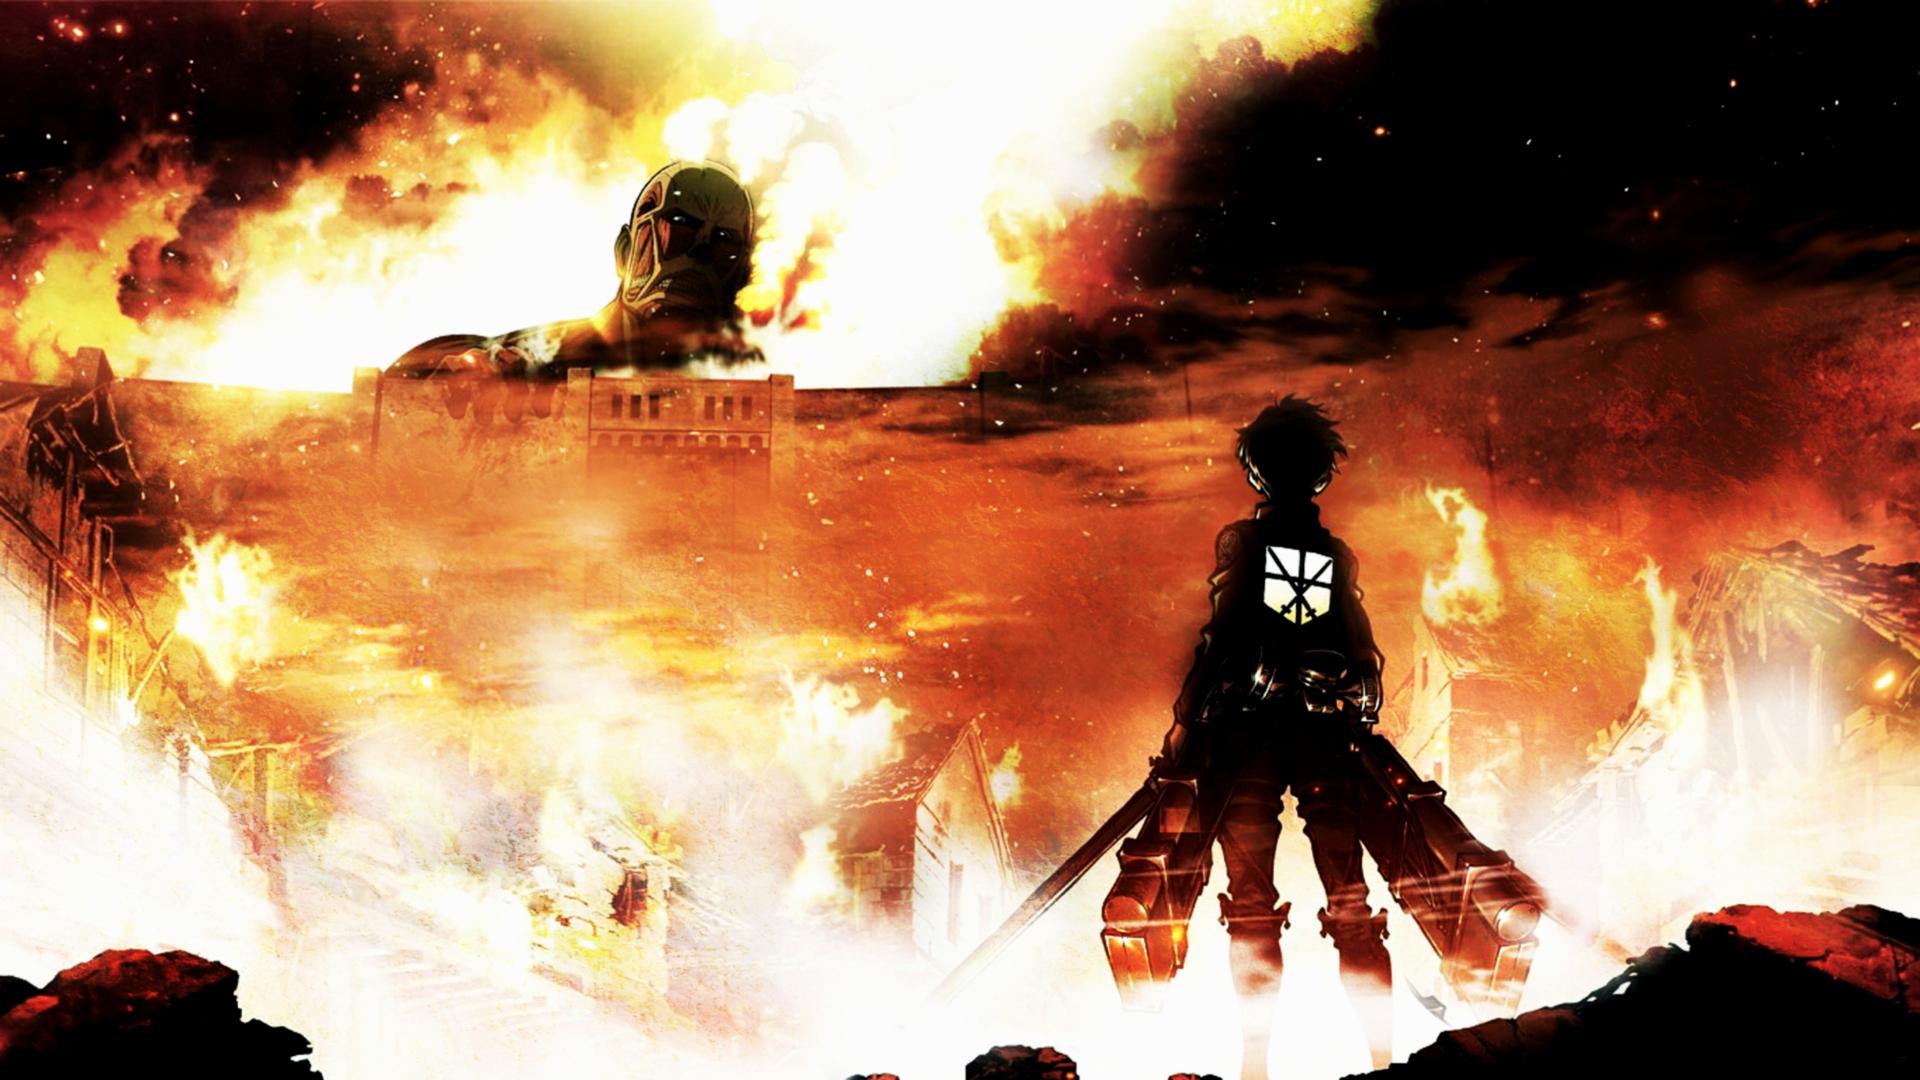 Attack On Titan Hd Wallpaper Zerochan Anime Image Board